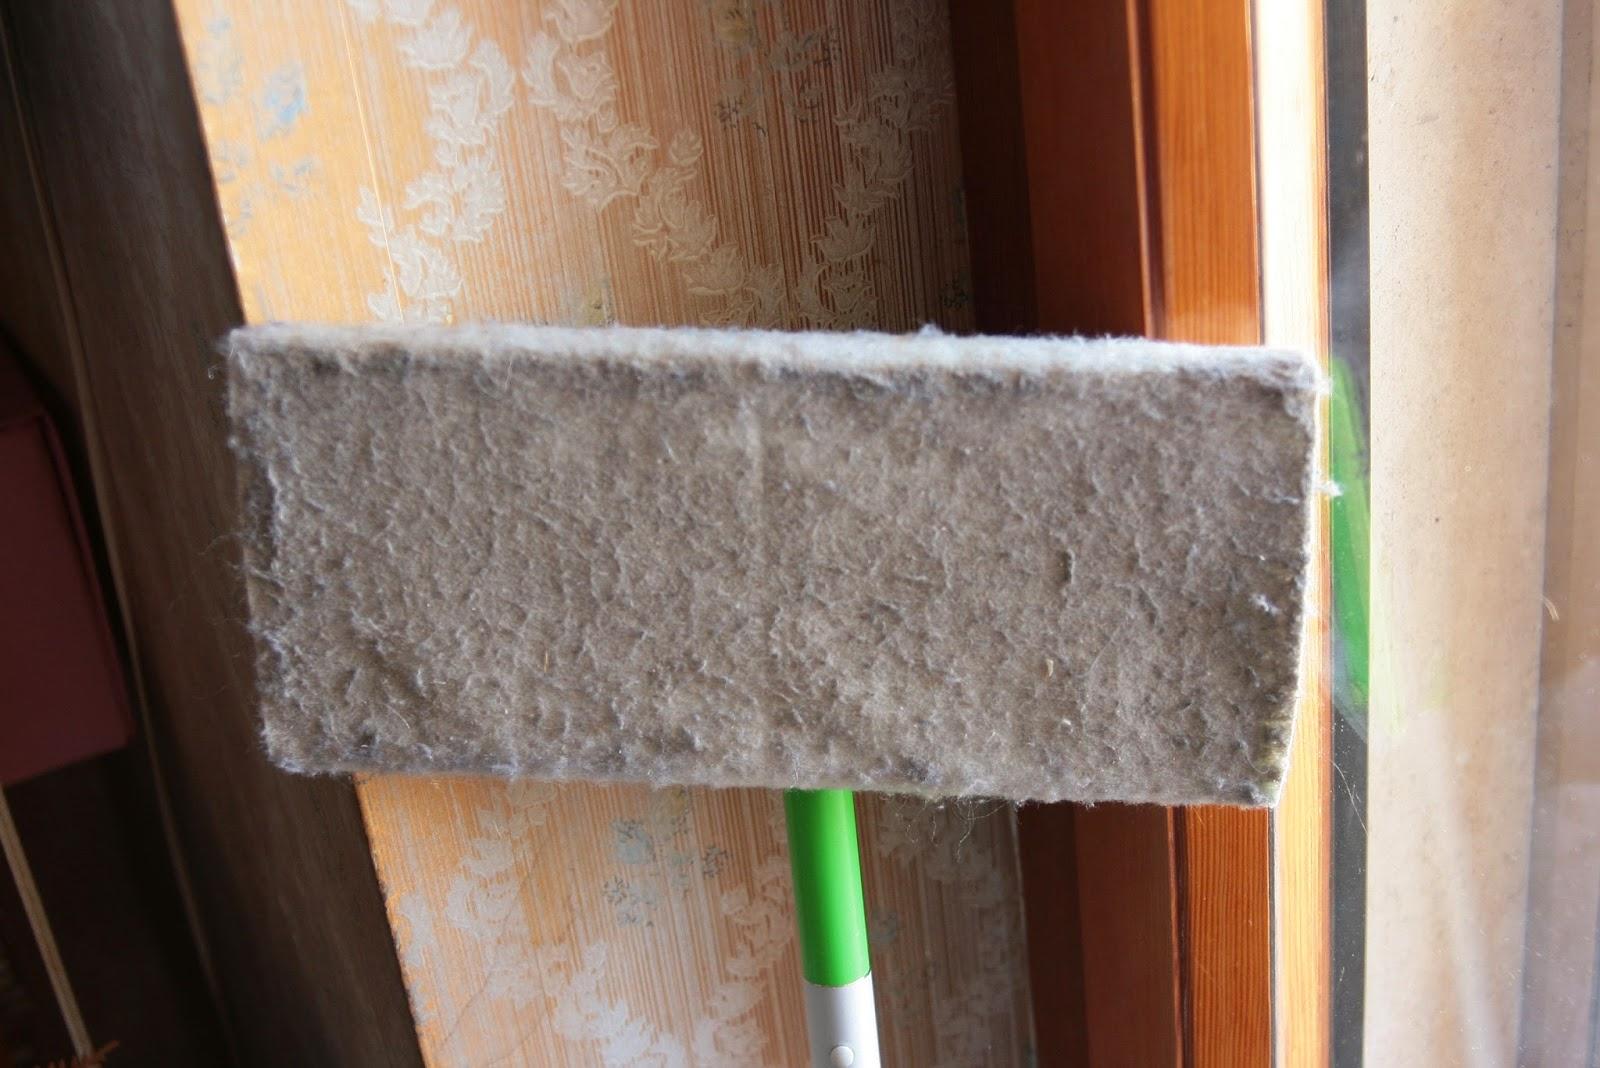 Cattura Polvere Fai Da Te.Cosmetici Naturali Fai Da Te Come Utilizzare Piu Volte I Panni